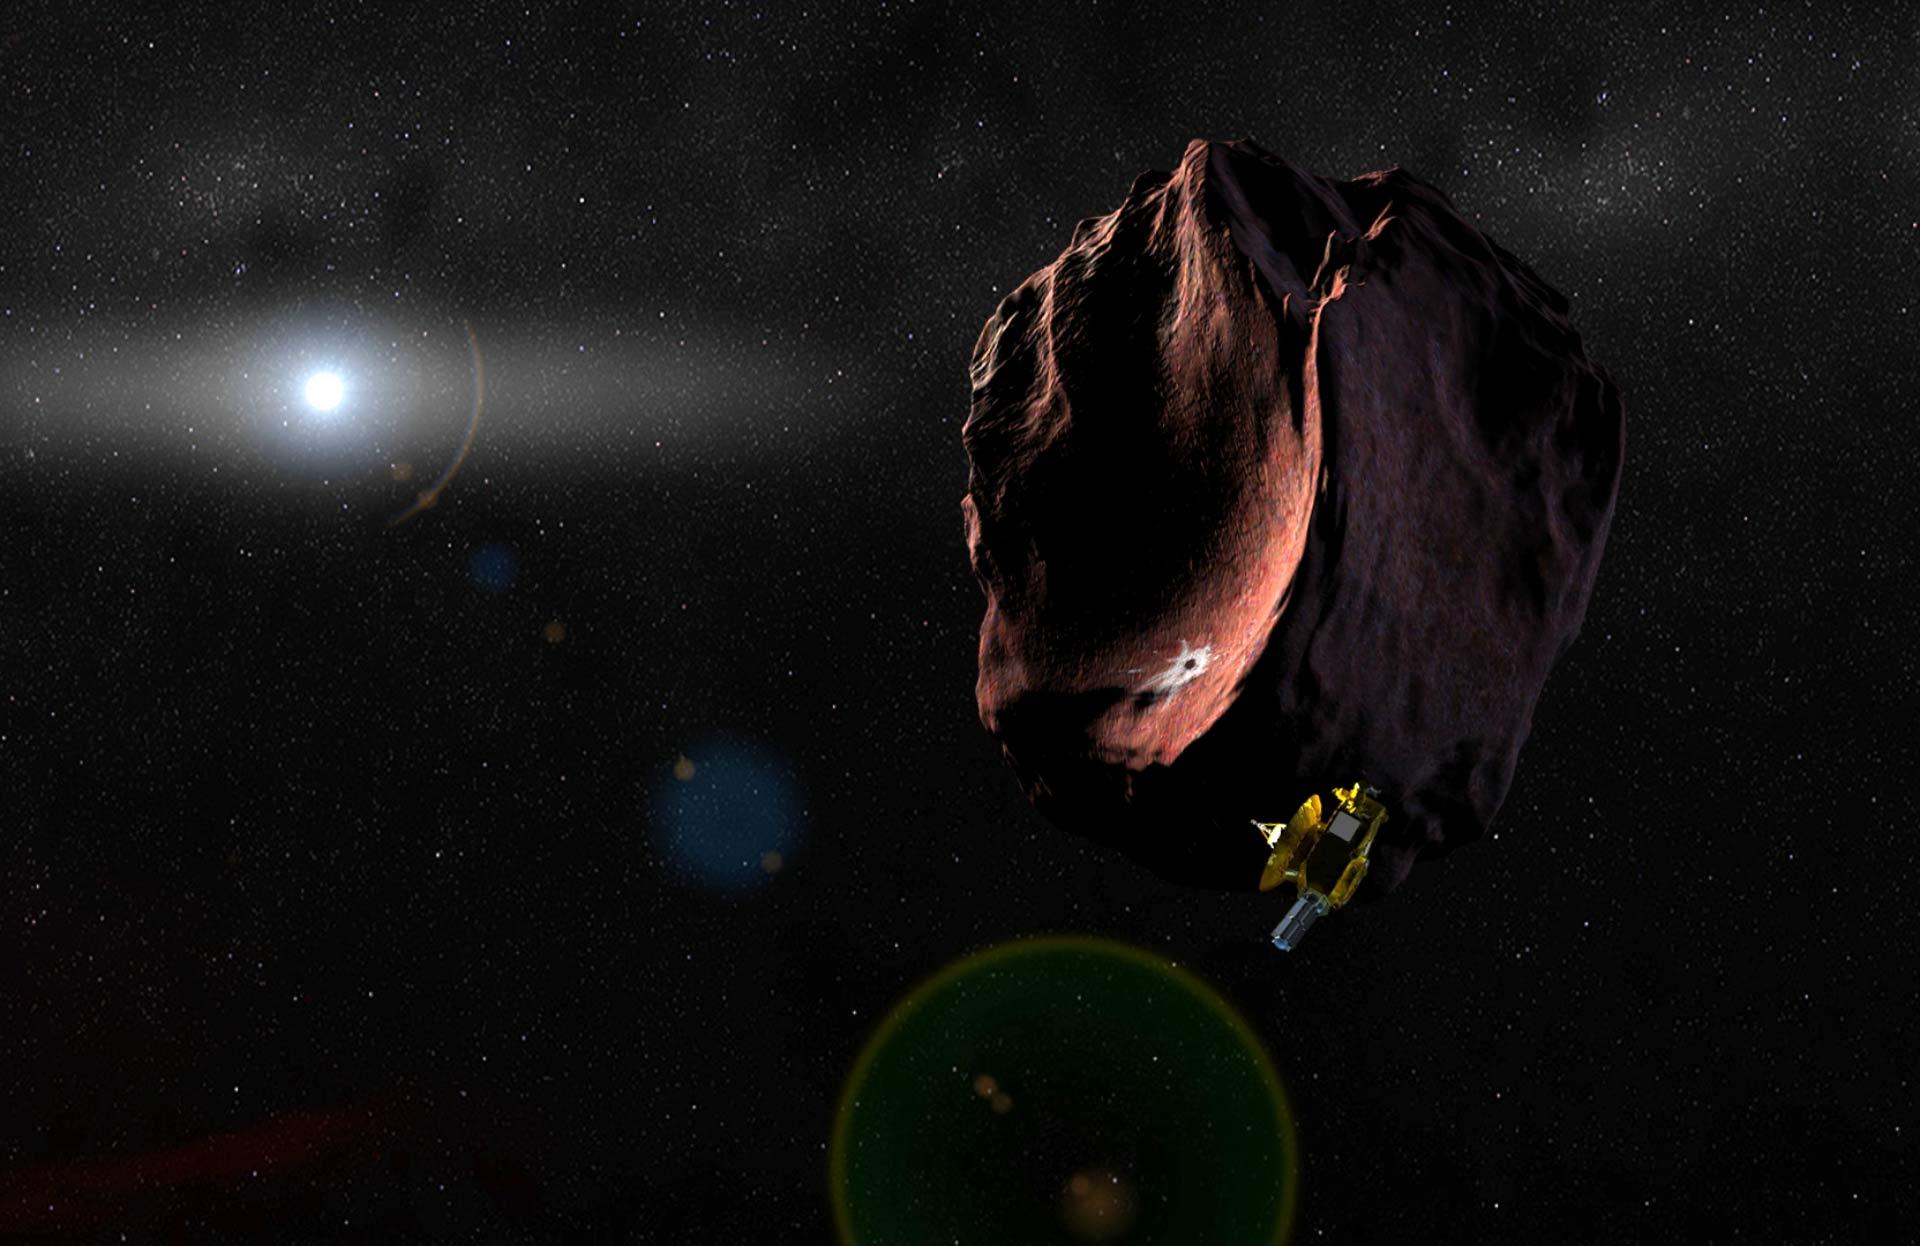 new horizons, new horizons spacecraft, new horizons ultima thule, new horizons mission, social cube, social cube patna